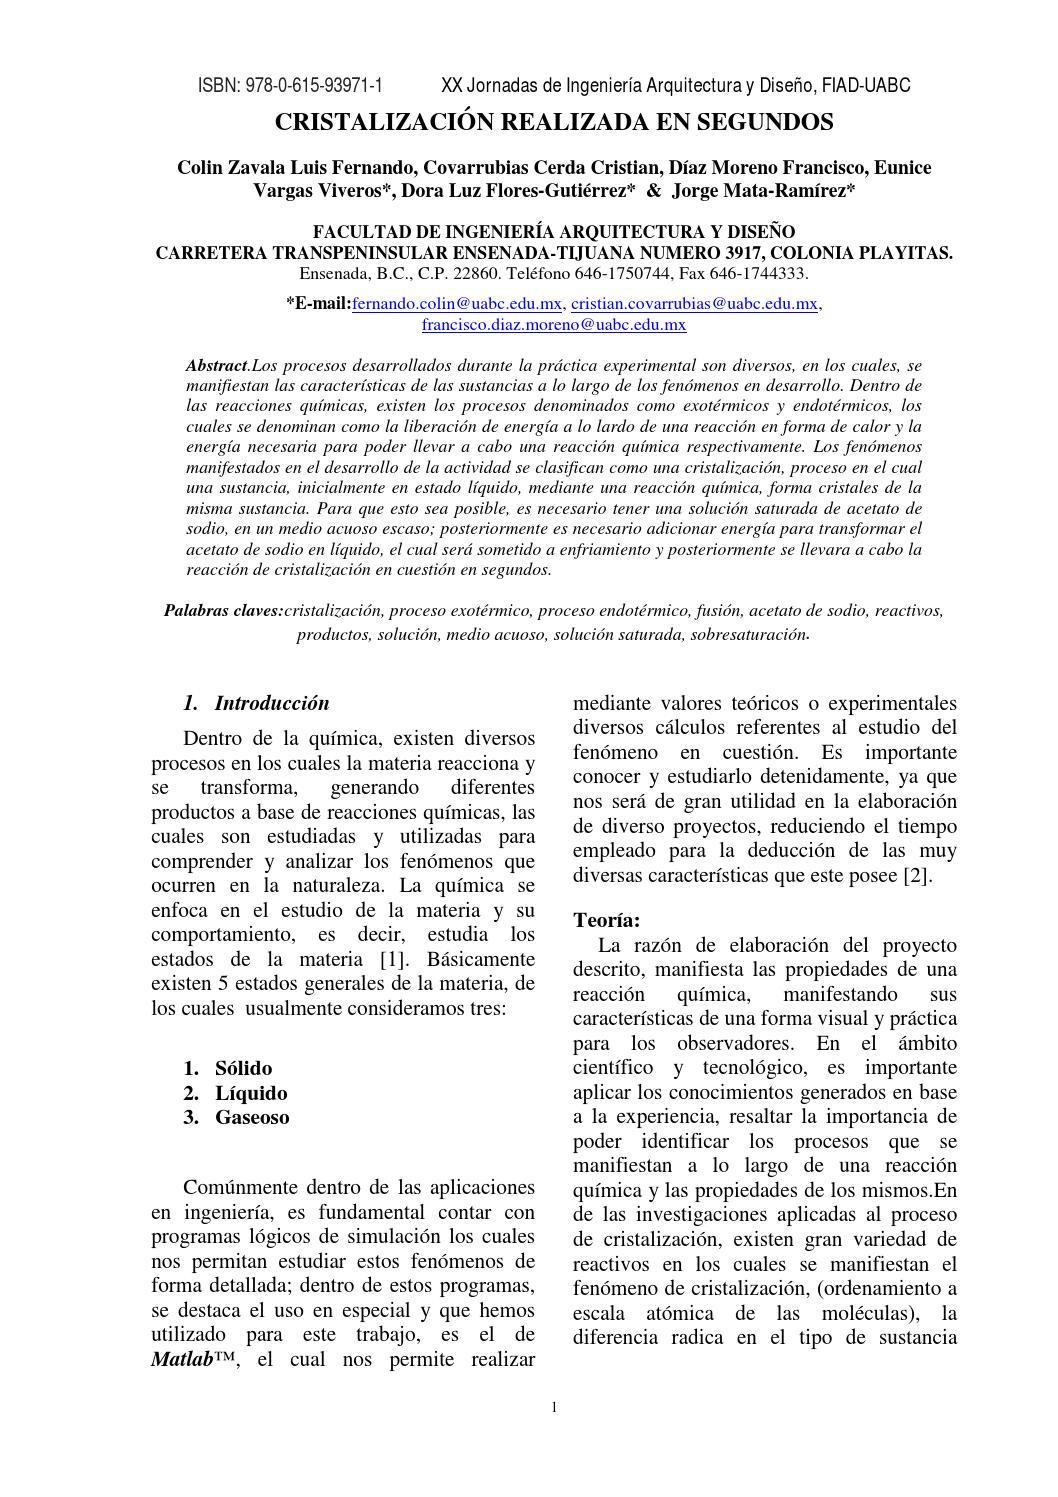 1 cristalizaci n realizada en segundos by manuel jimenez Arquitectura y diseno uabc